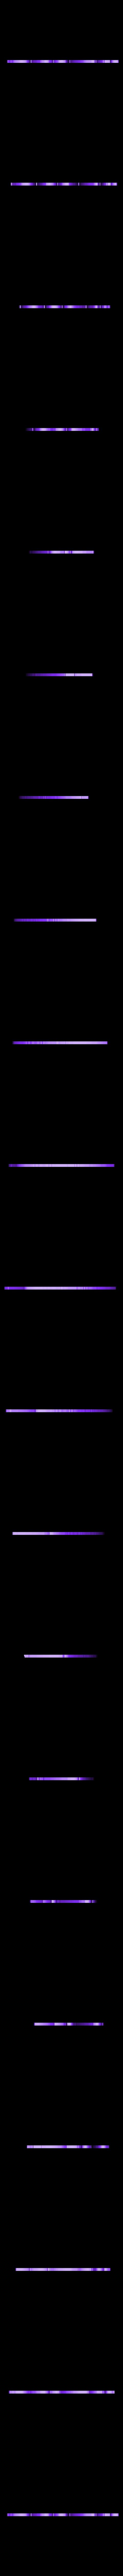 Bat wing Laces Left.stl Download free STL file Lace Up Bat Wings • 3D print design, amiedd